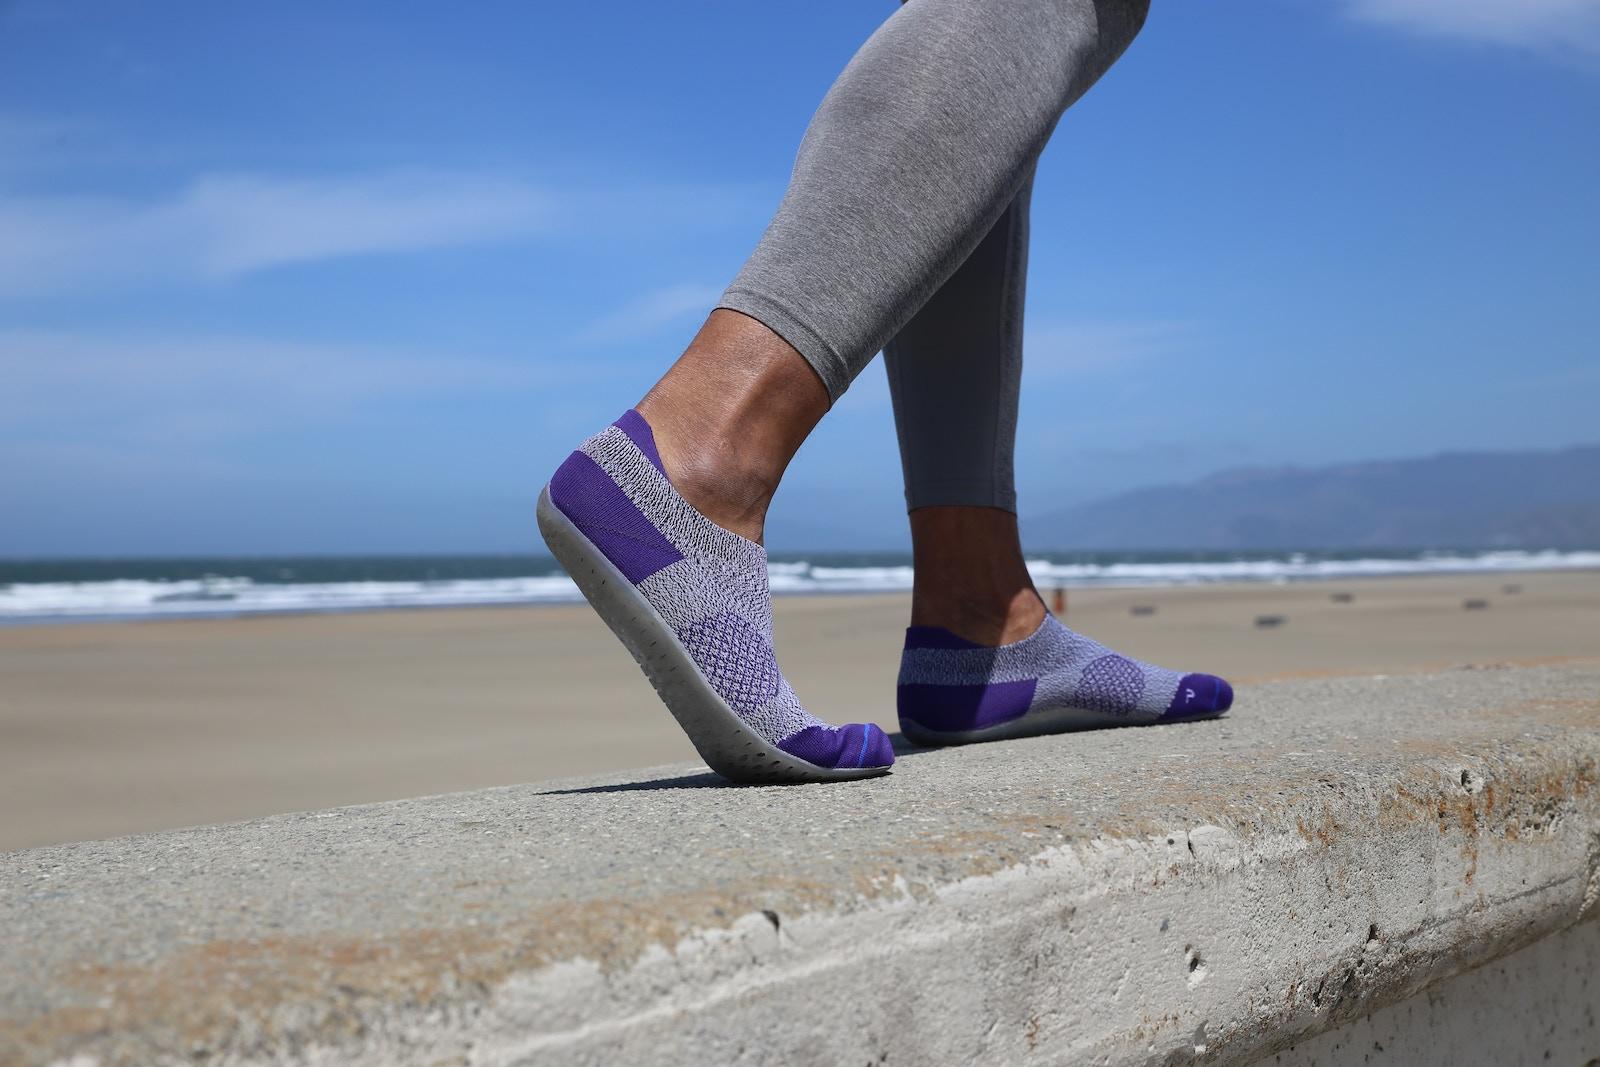 Parásole - Revolutionary 3D Recovery Socks